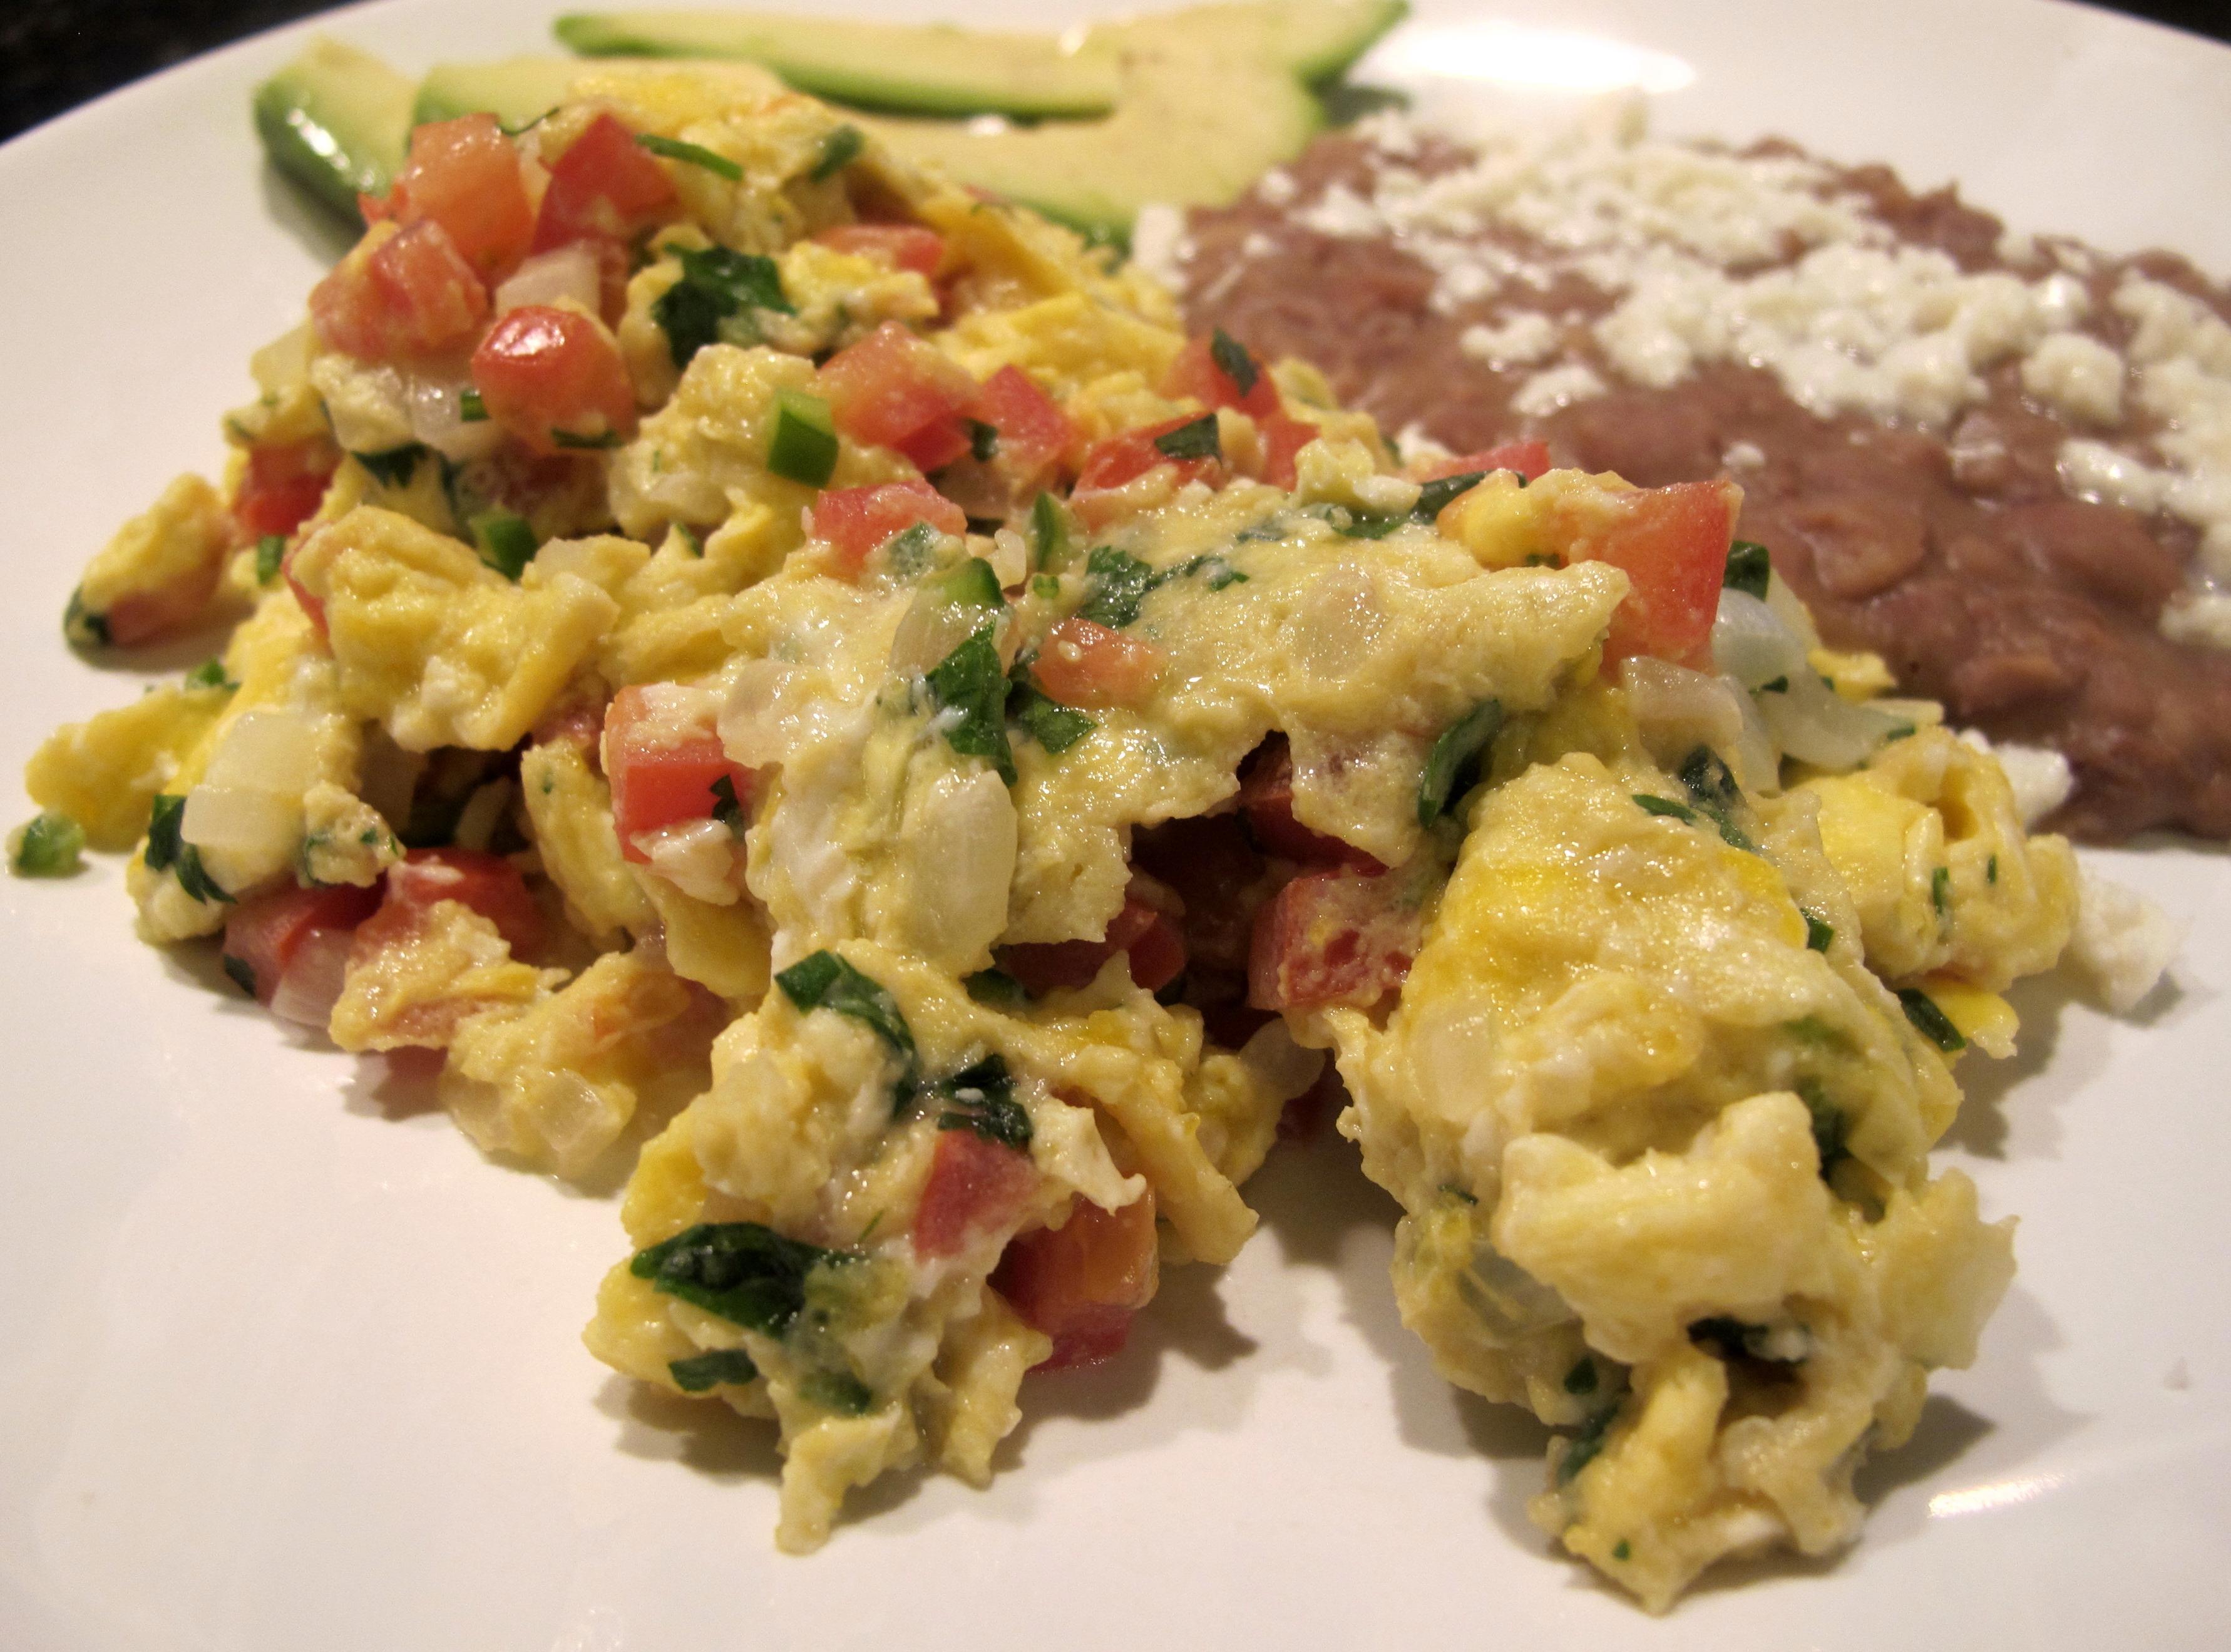 ncheros huevos r a ncheros huevos r huevos a la mexicana café la ...